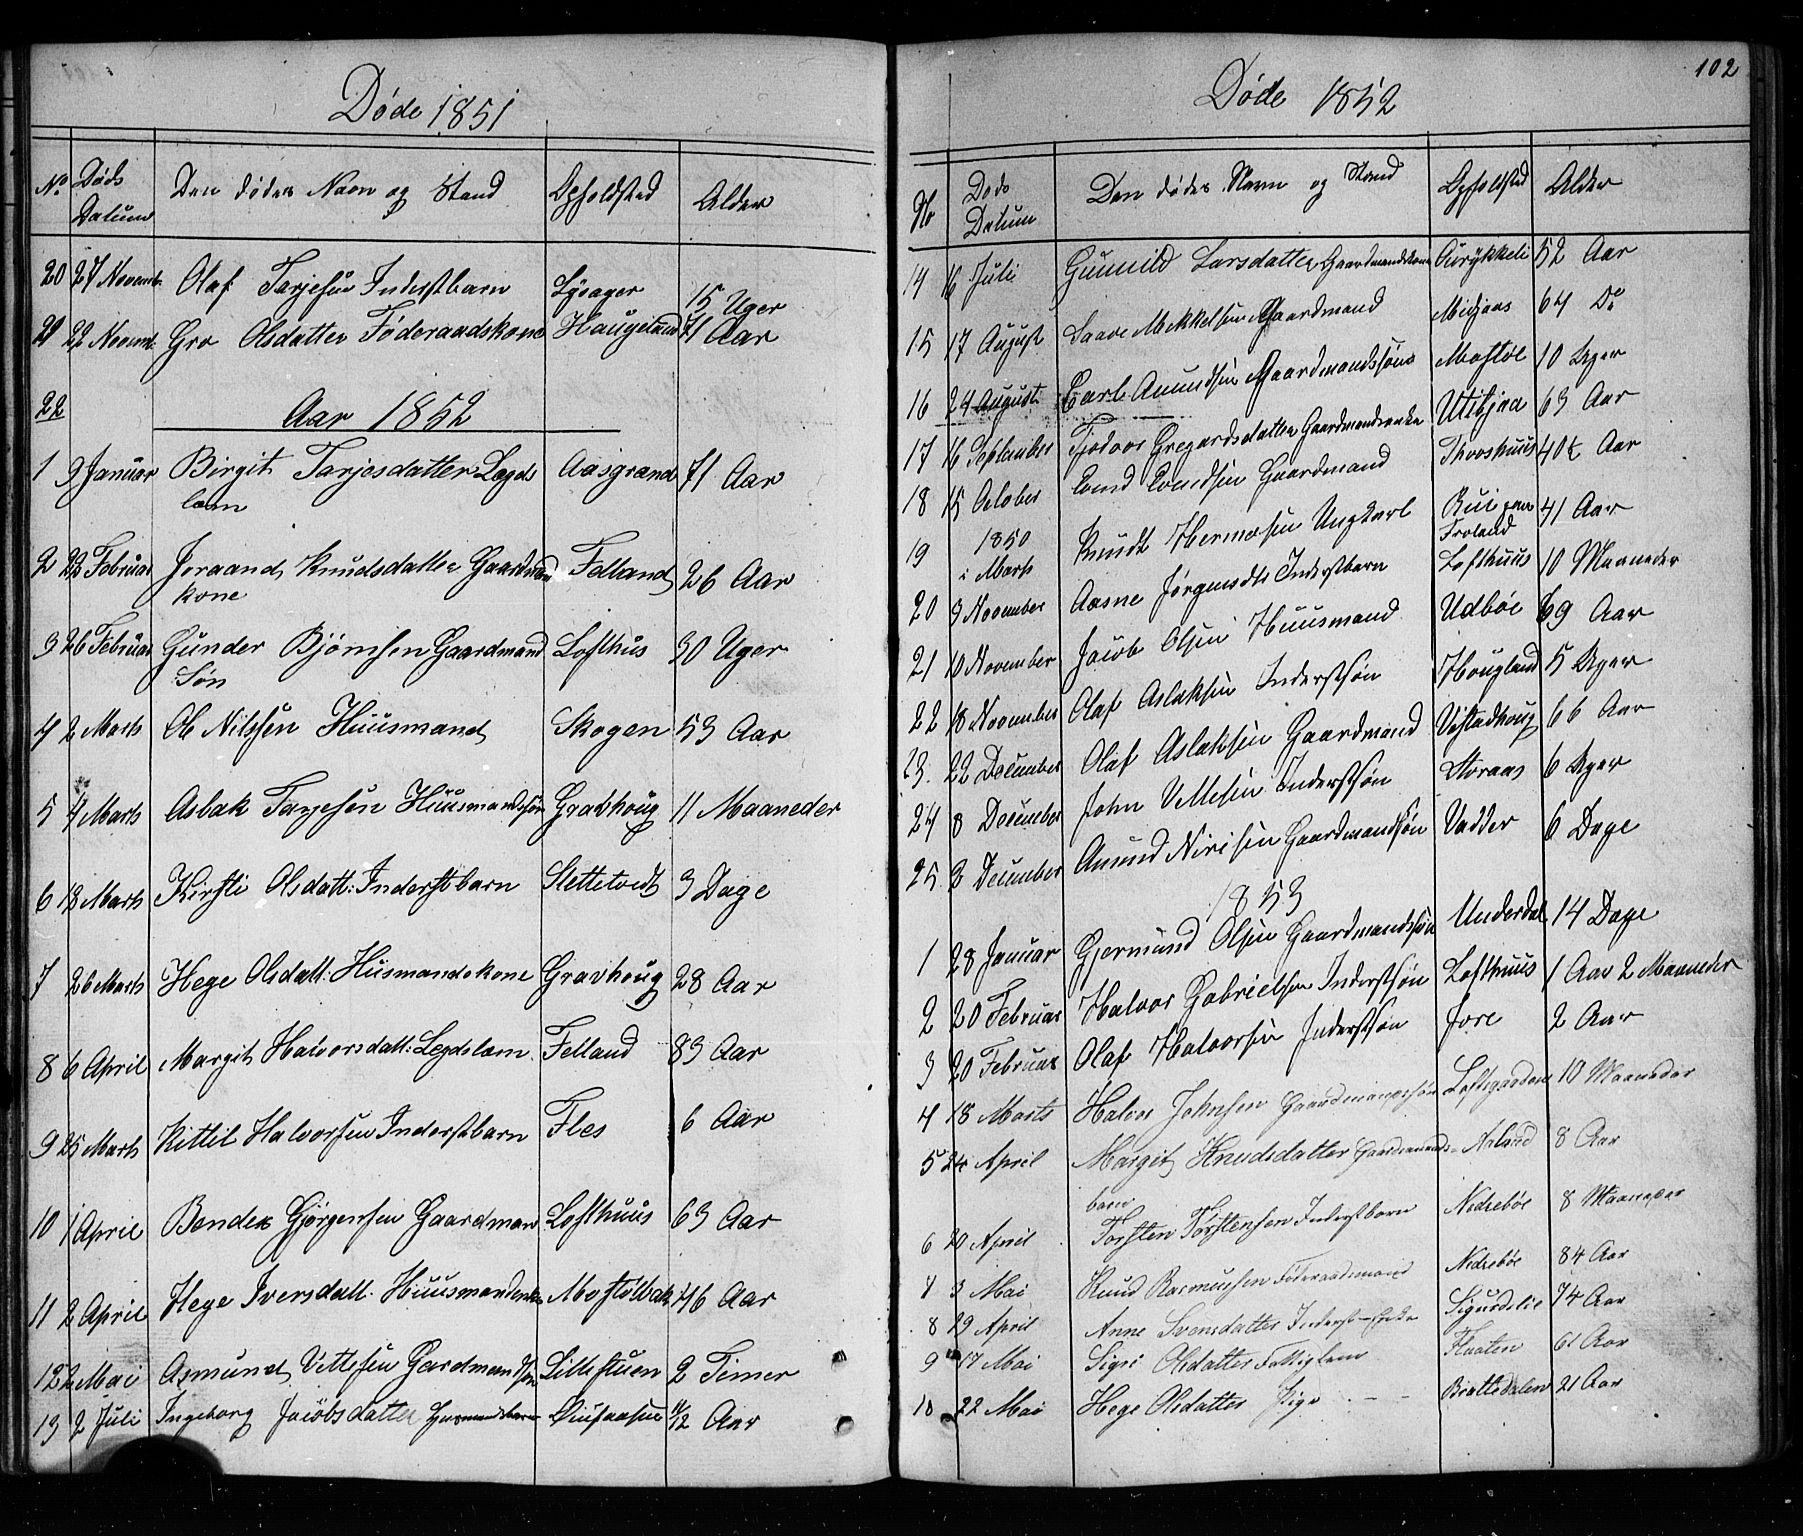 SAKO, Mo kirkebøker, G/Ga/L0001: Klokkerbok nr. I 1, 1851-1891, s. 102